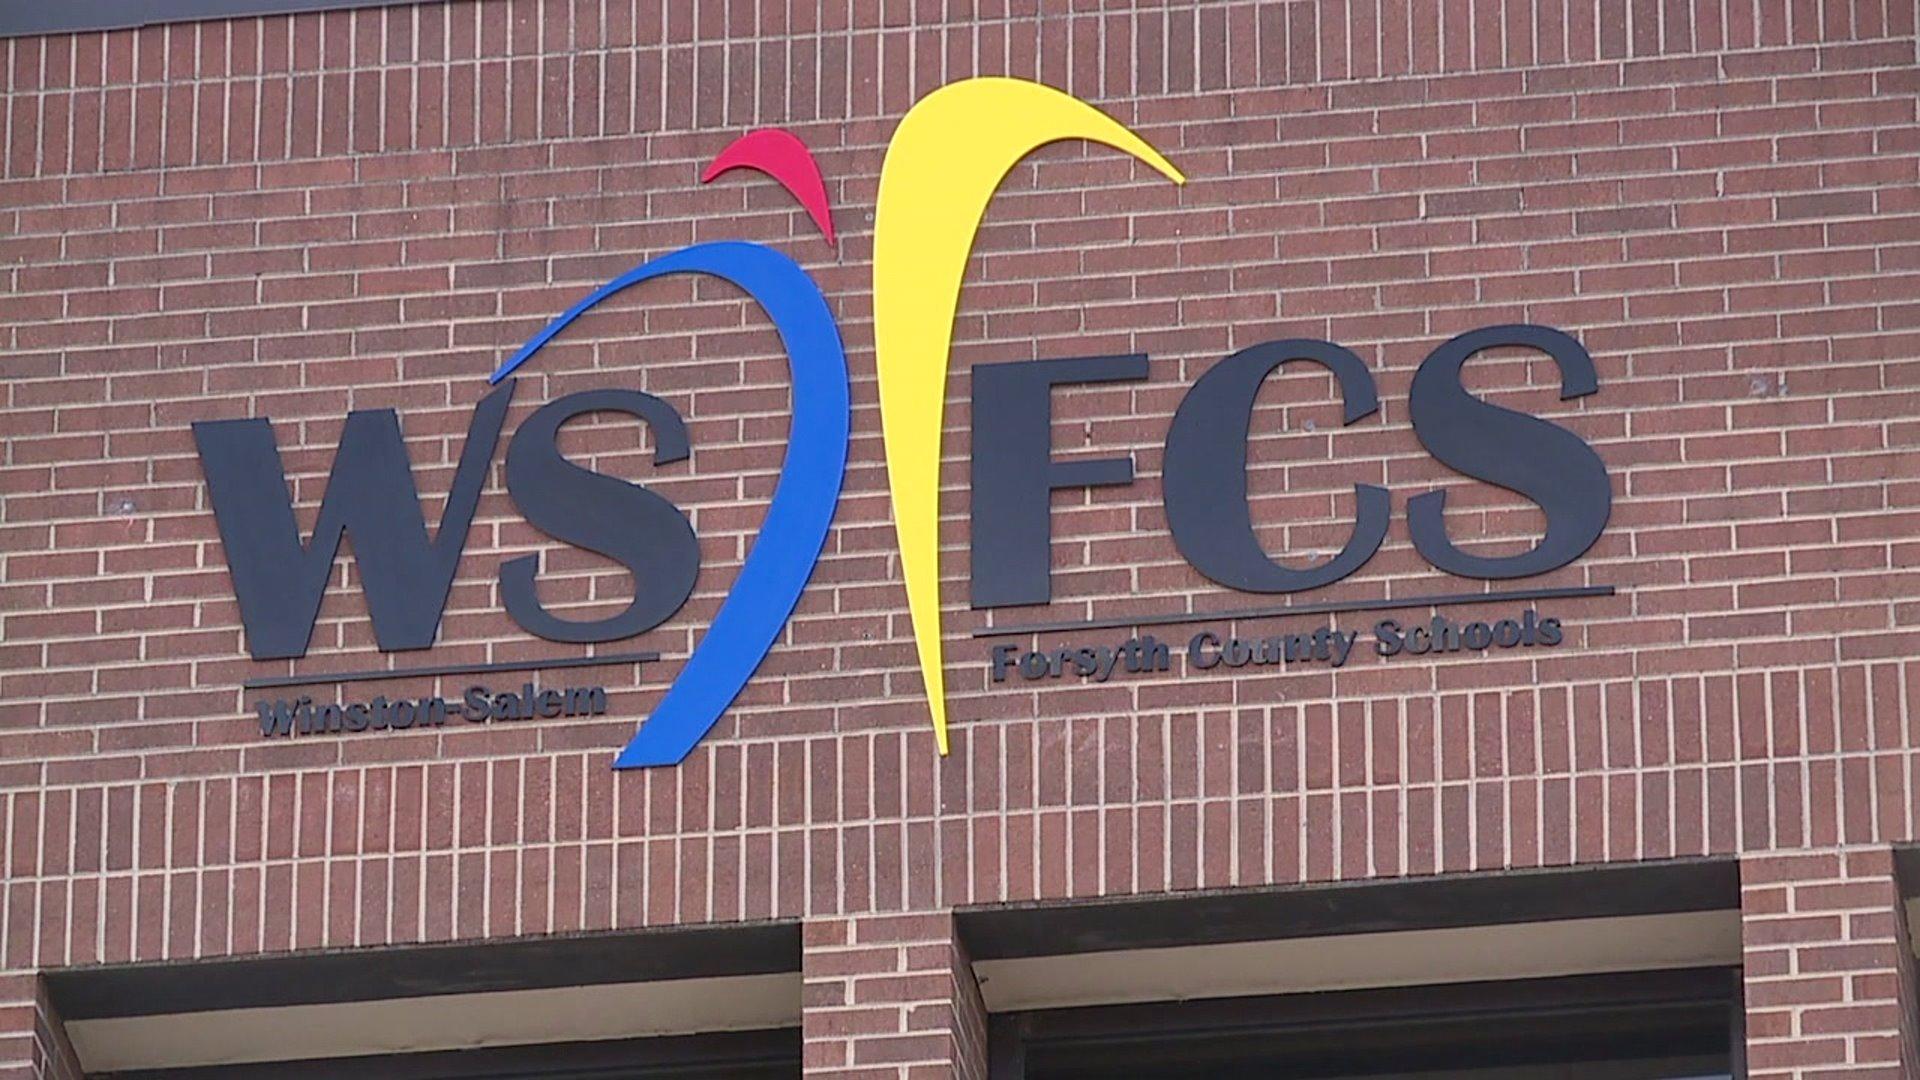 Winston Salem/forsyth County Schools Holds Meeting To Pertaining To Winston Salem Forsyth County Schools Calendar